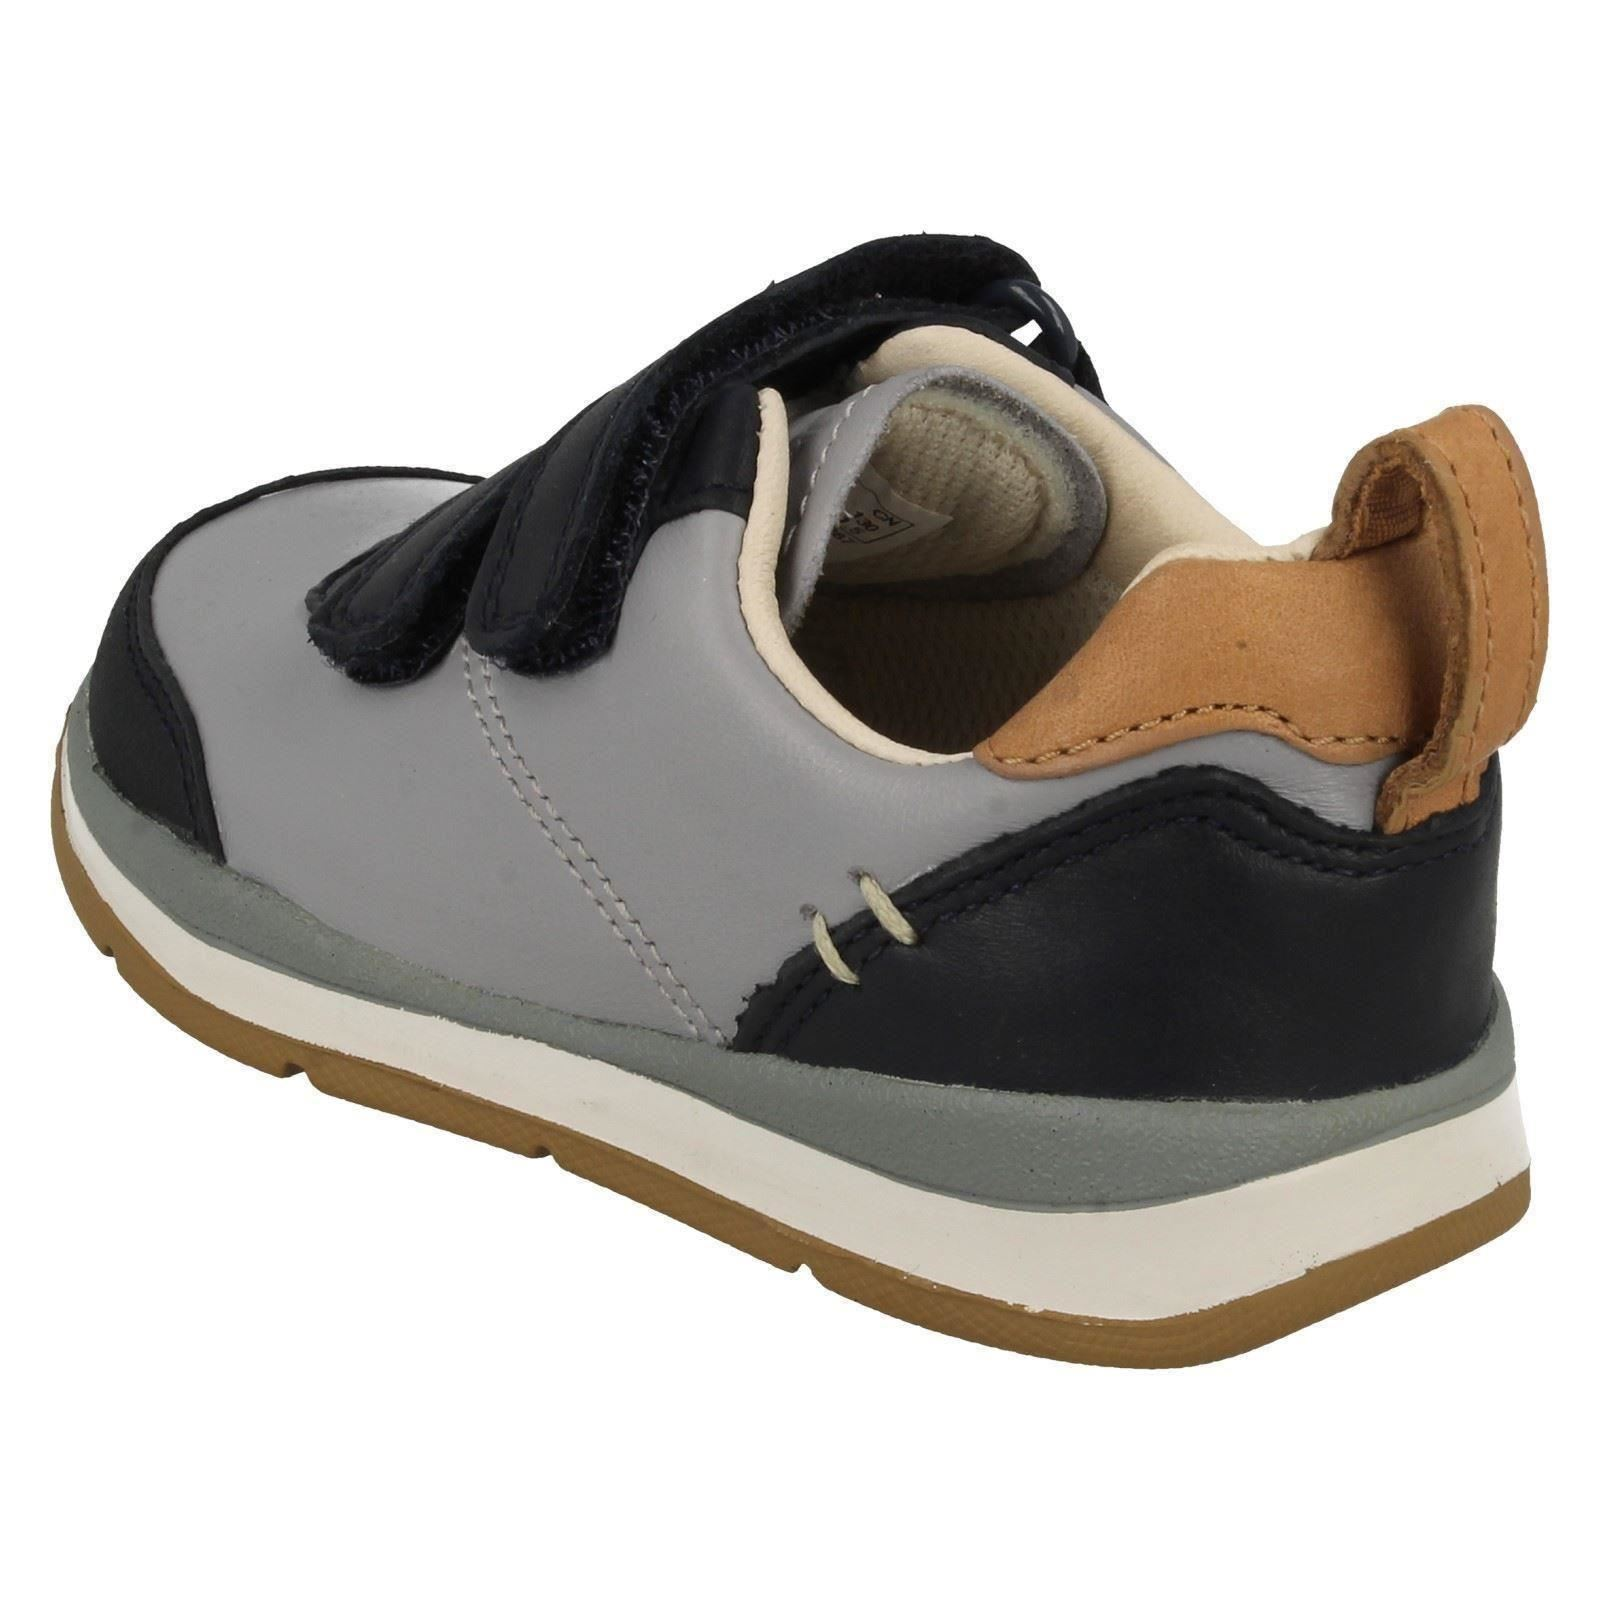 infant boys clarks stylish walking shoes ferris cap